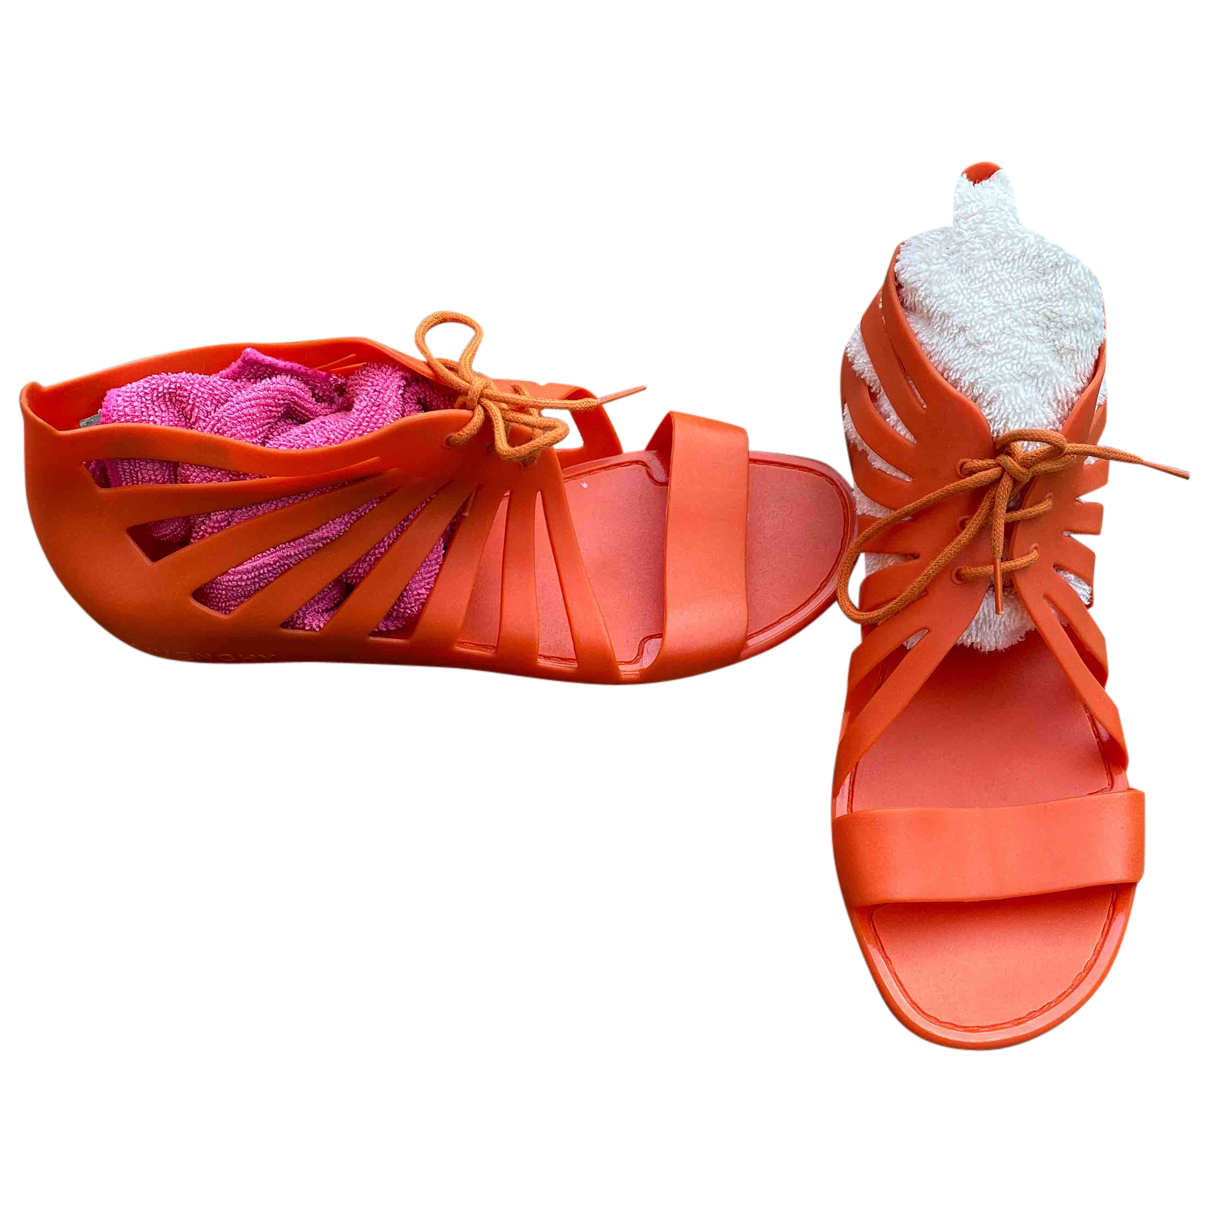 Sandalias romanas Givenchy